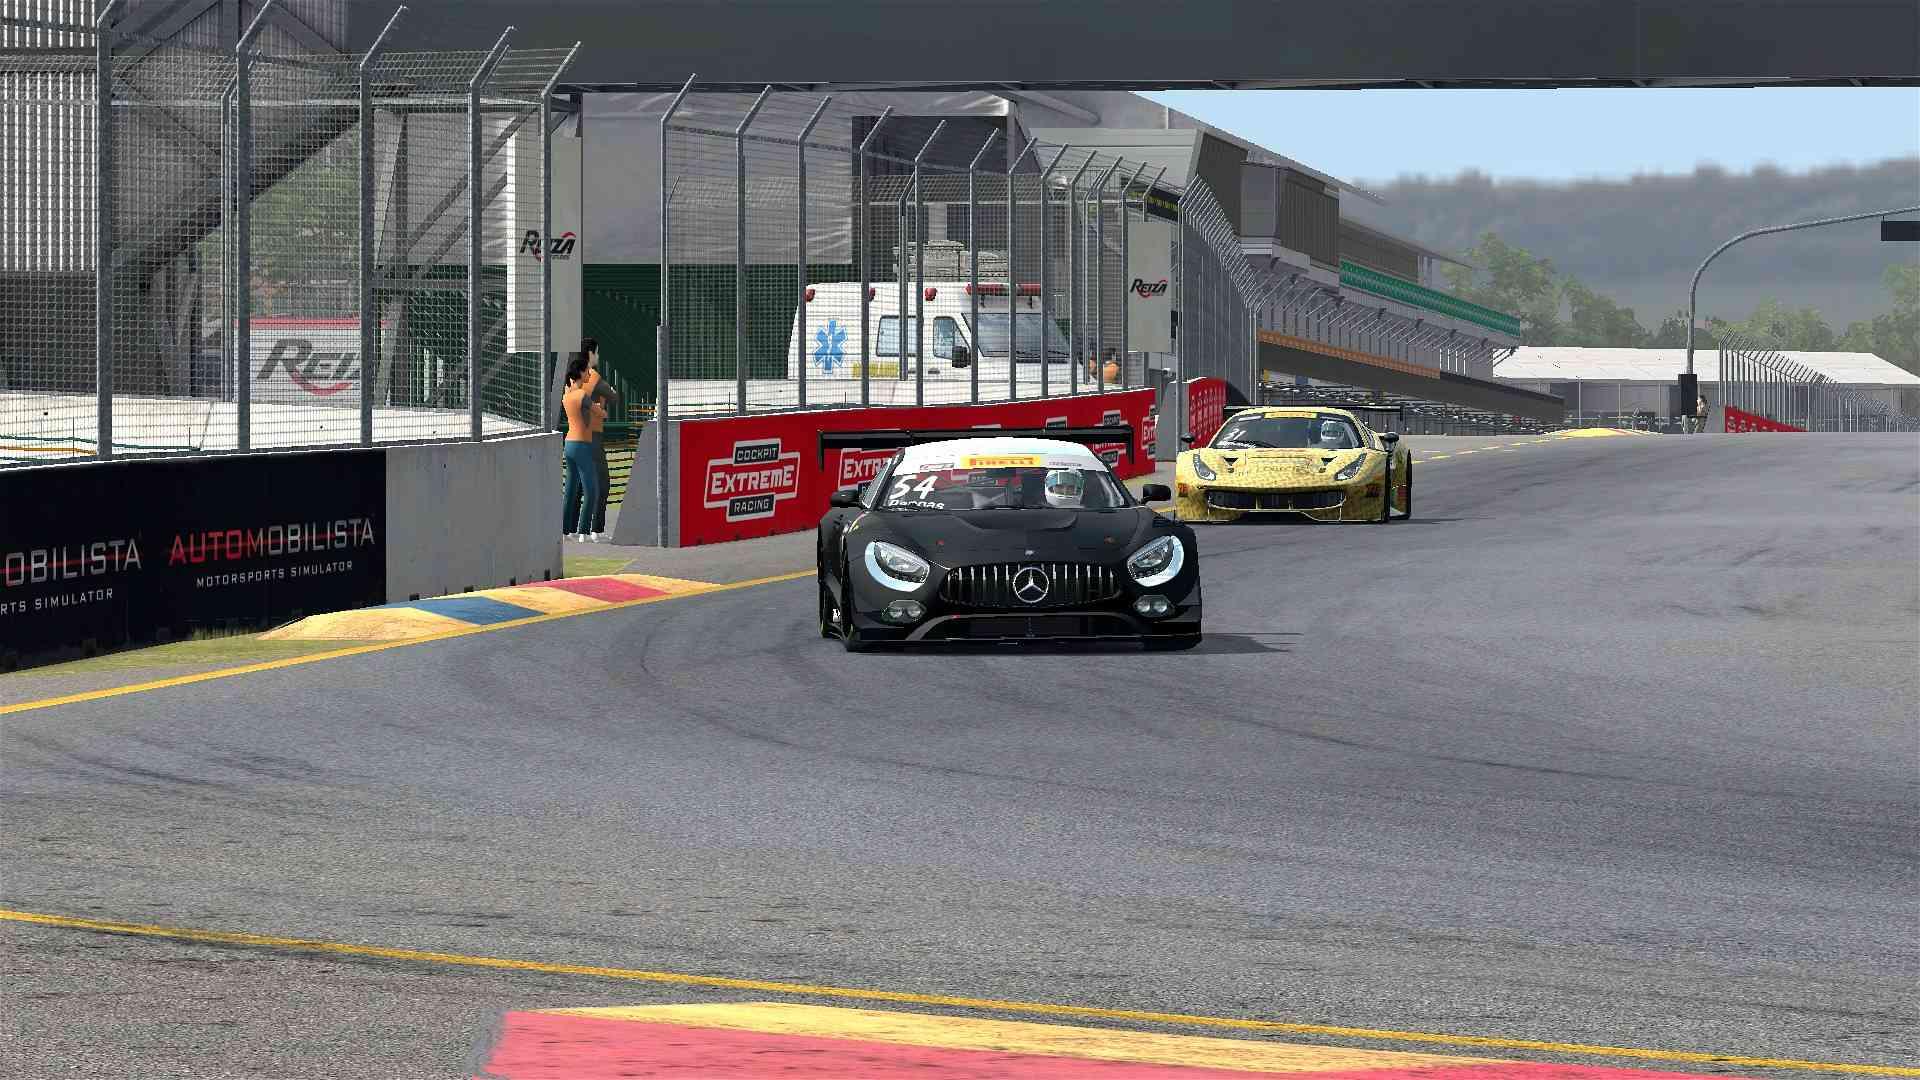 AMS Pirelli World Challenge 2017 v0.6 - Released 20170411